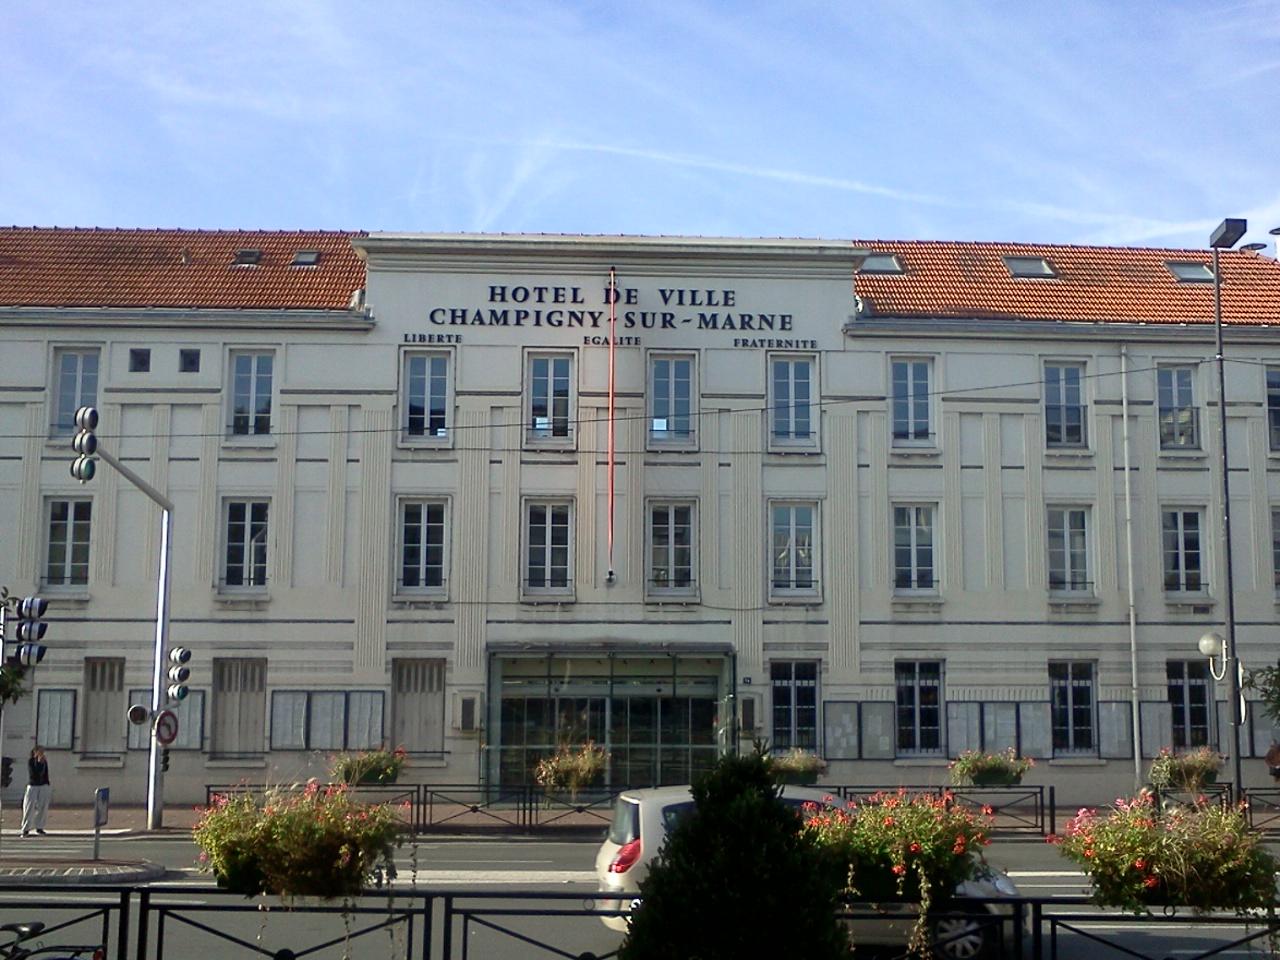 Champigny-sur-Marne France  city images : hôtel de ville de Champigny sur Marne